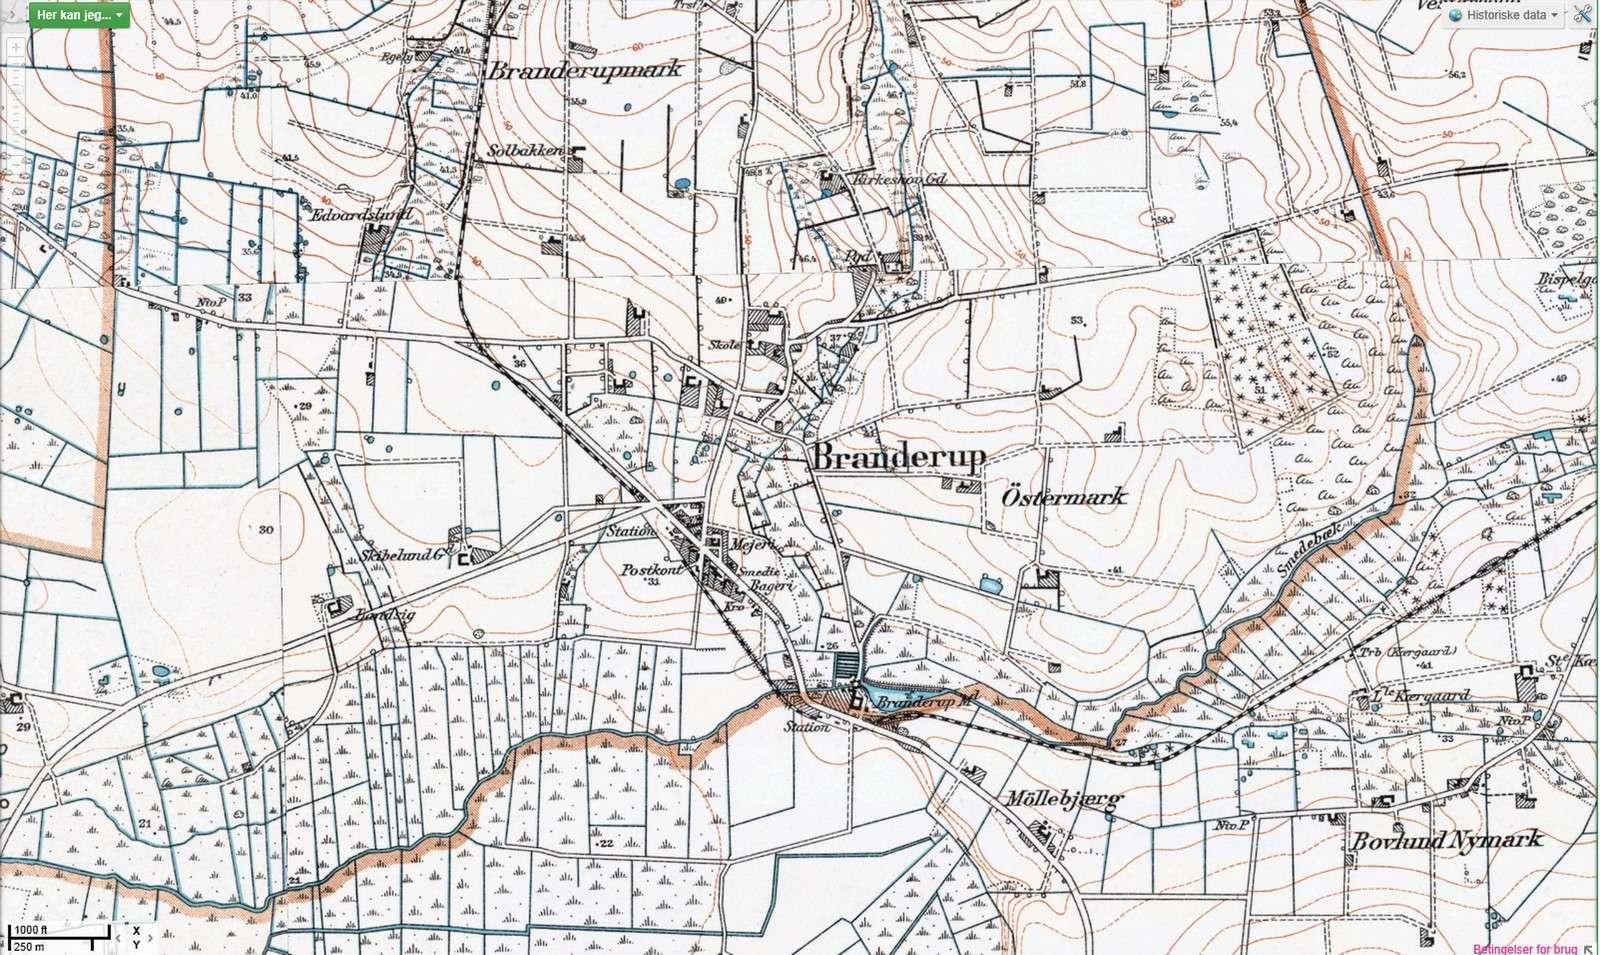 Historisk landkort krympet til hjemmesiden